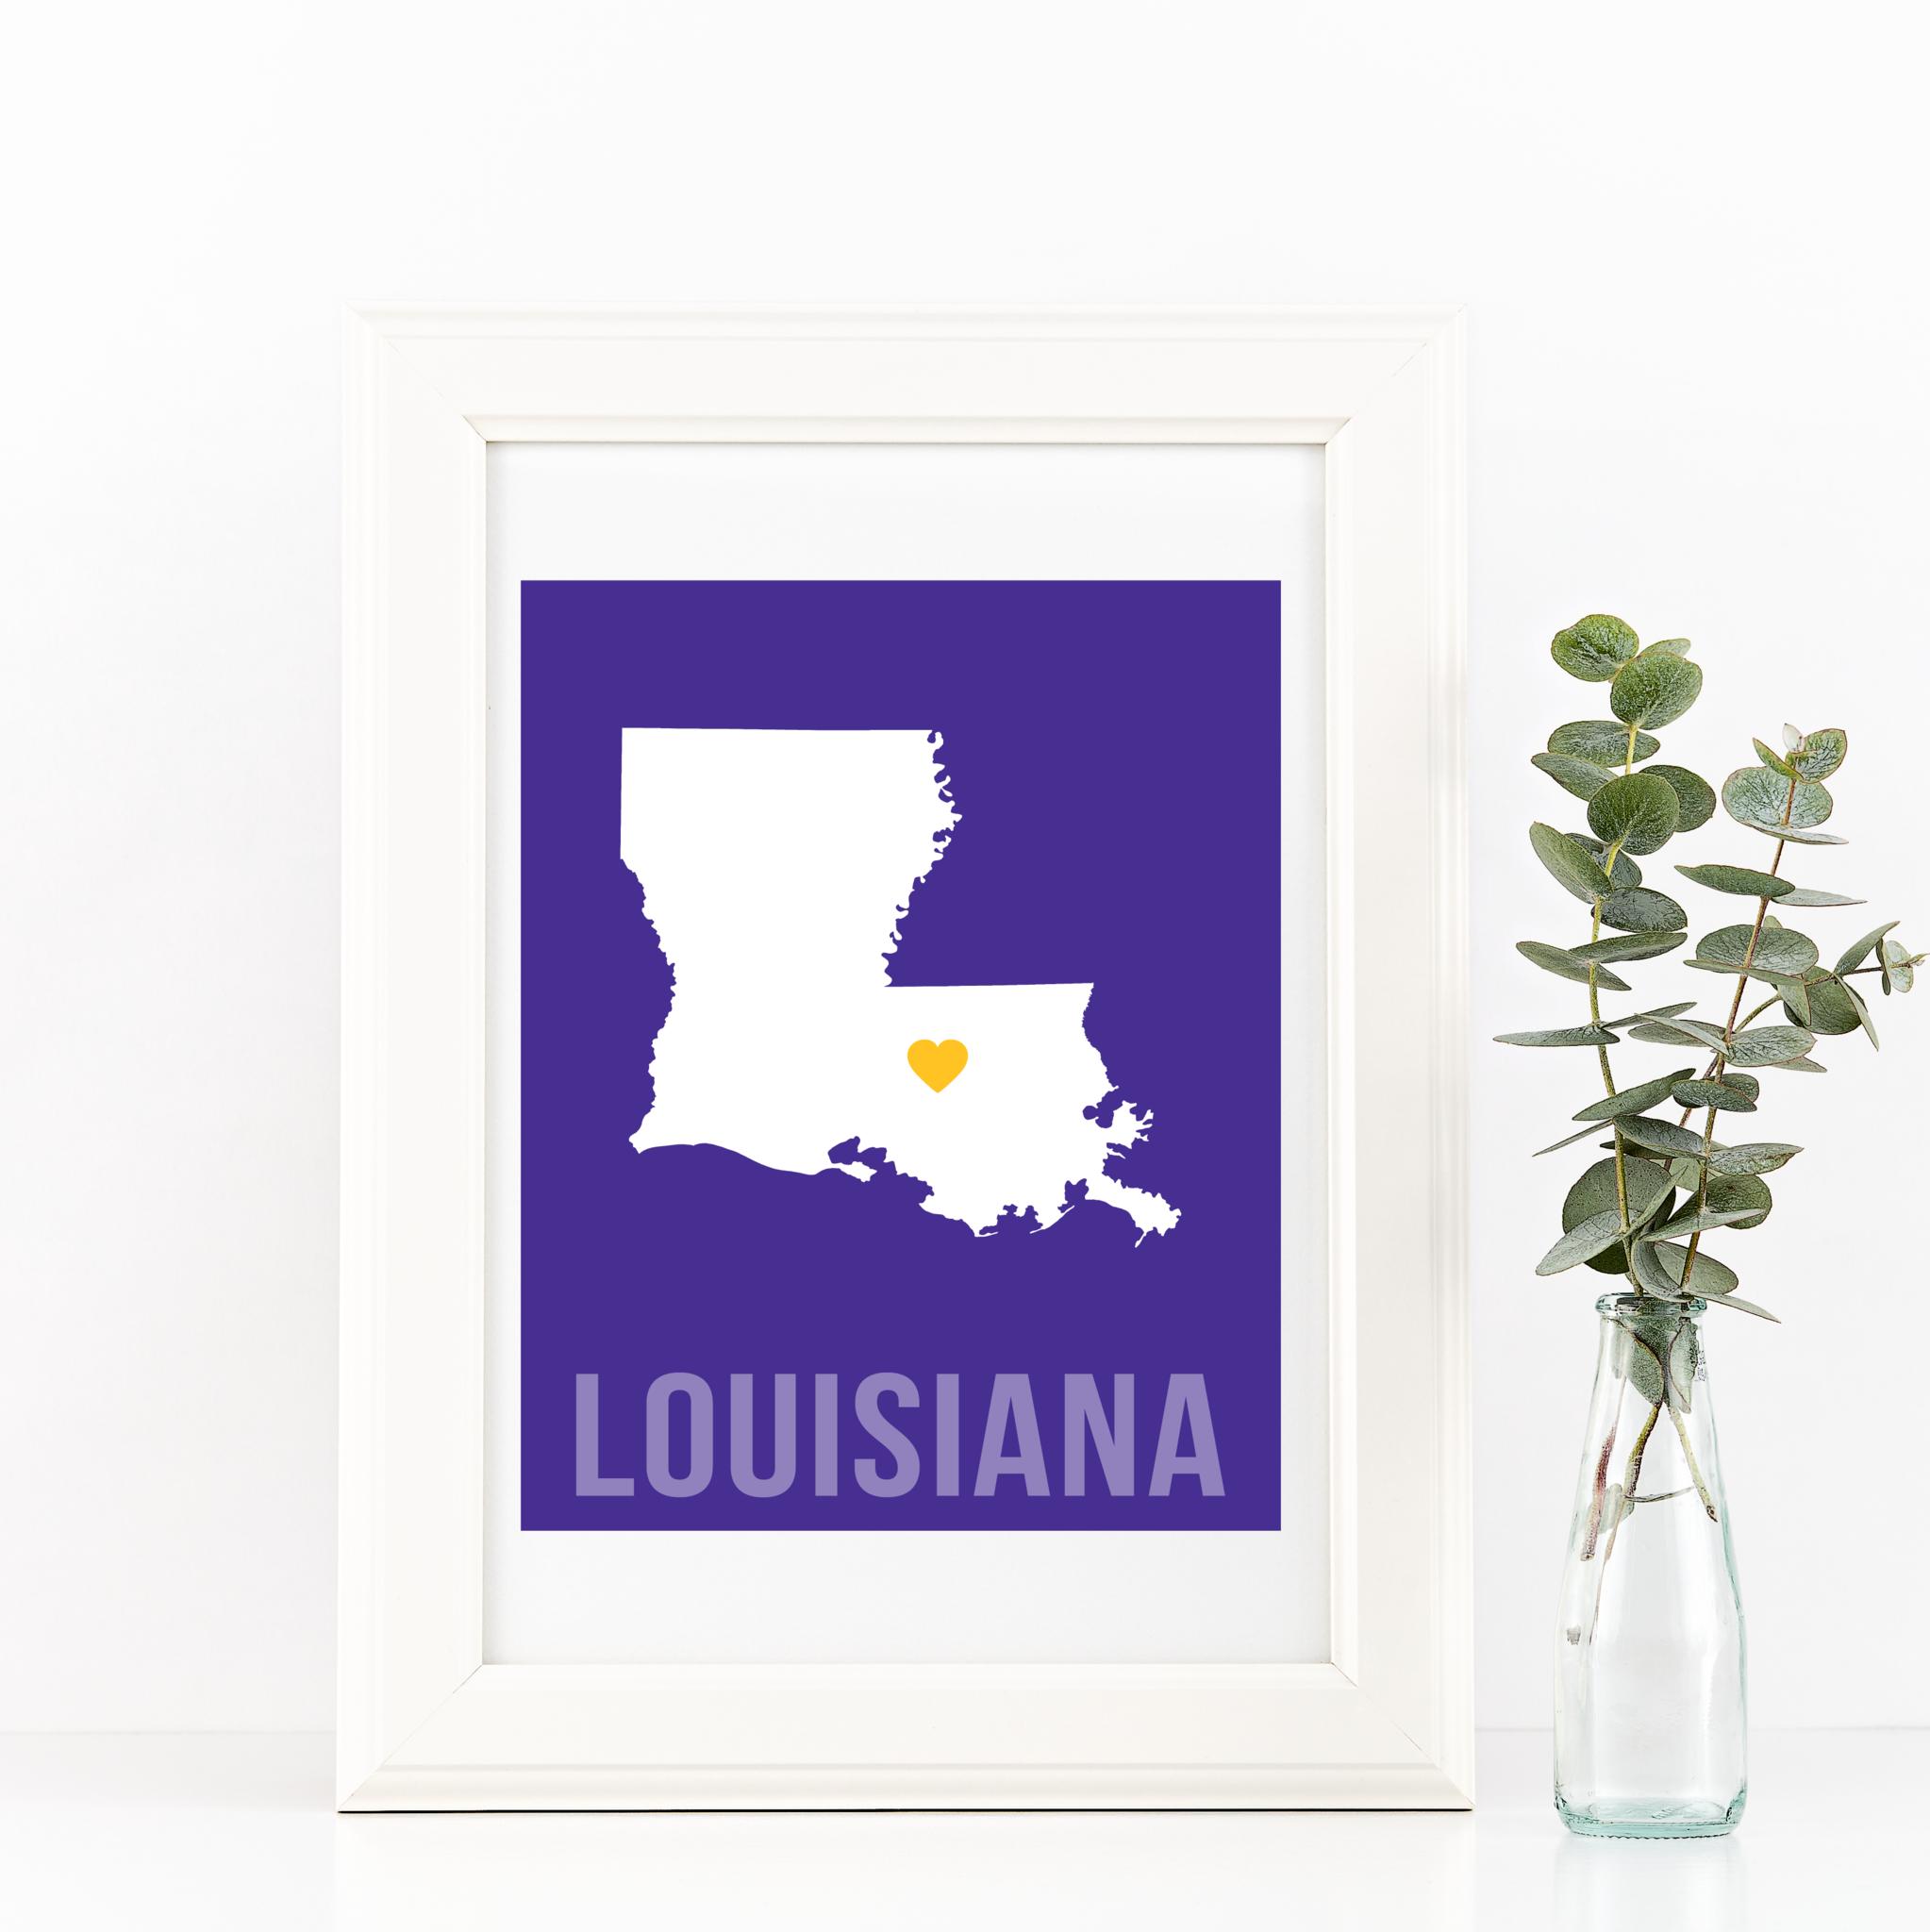 Louisiana Print Louisiana homes, Wall art, Colorful